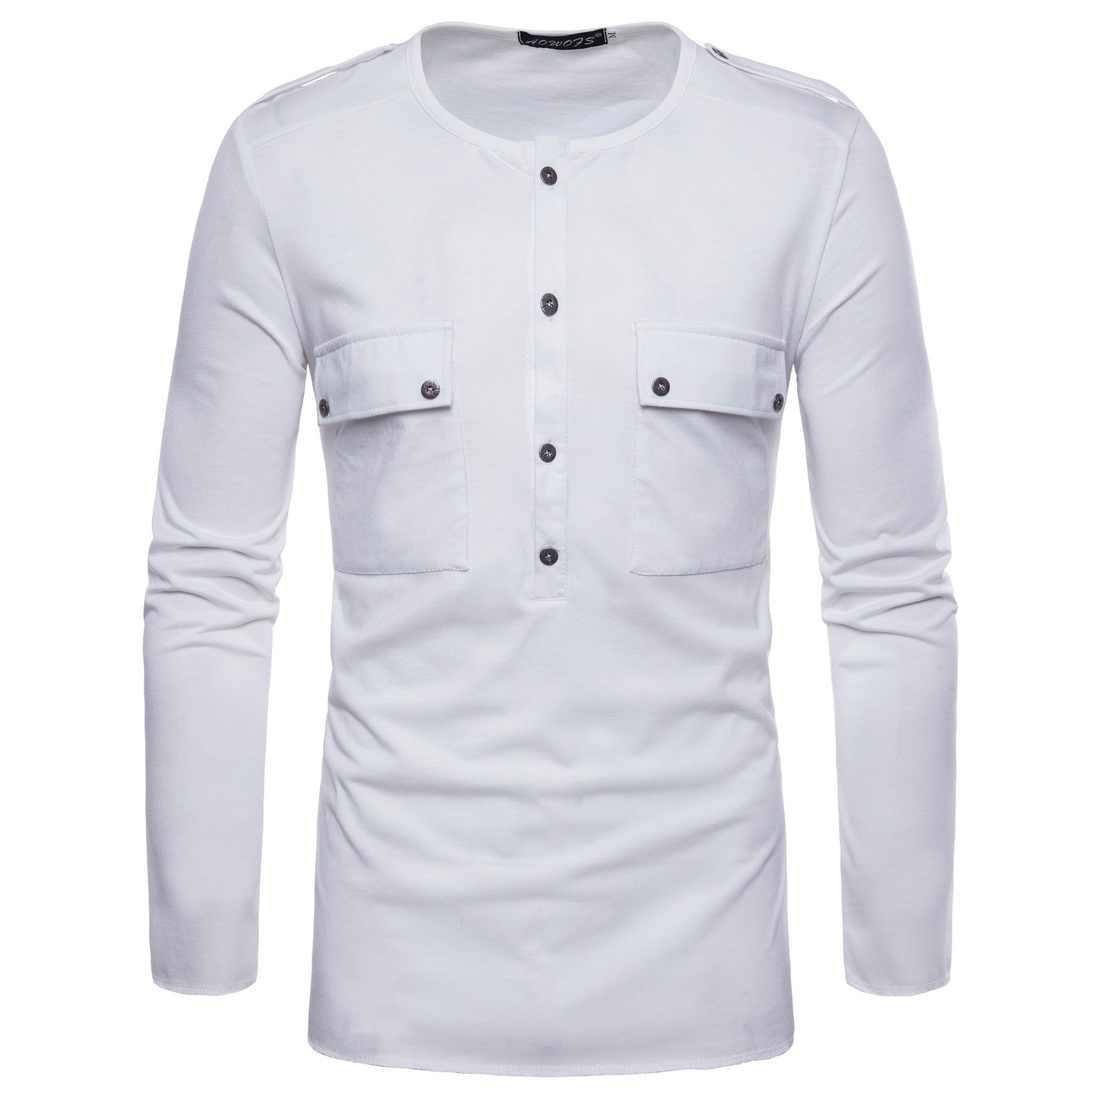 acb955e3 T Shirt Men Fashionable Menswear Spring New White O-neck Long Sleeve  Streetwear T-